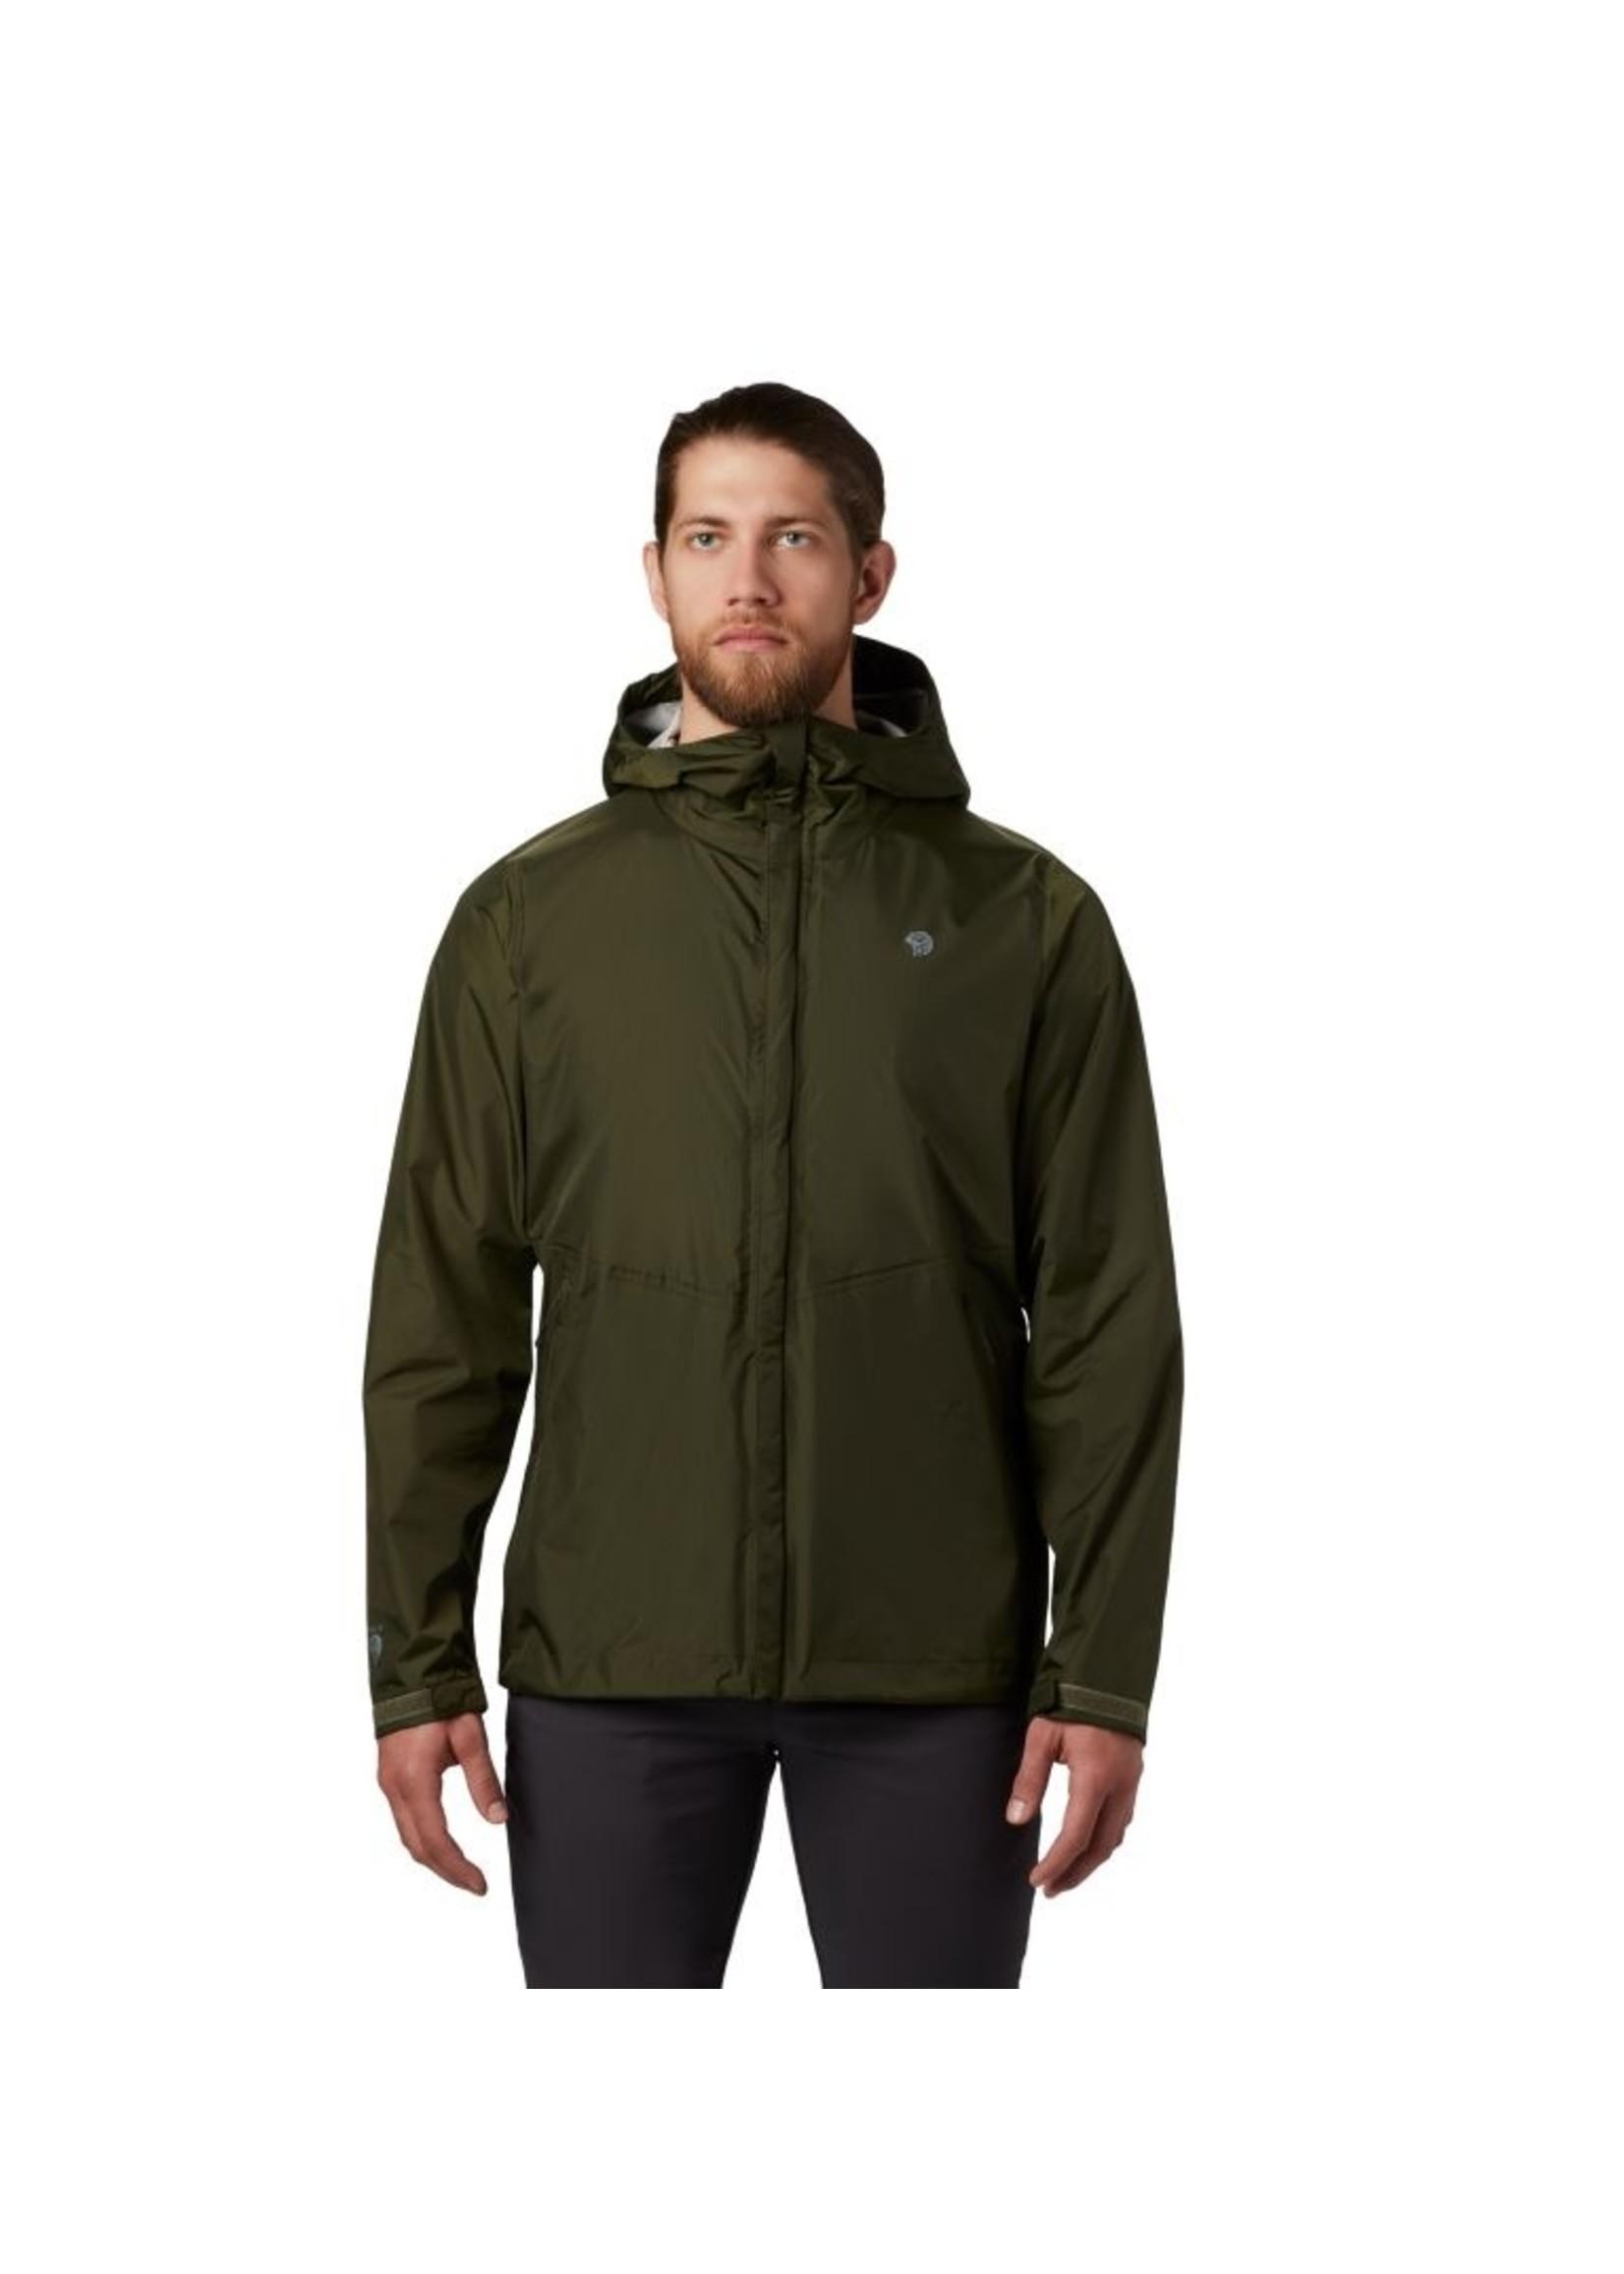 Mountain Hardwear ACADIA JACKET